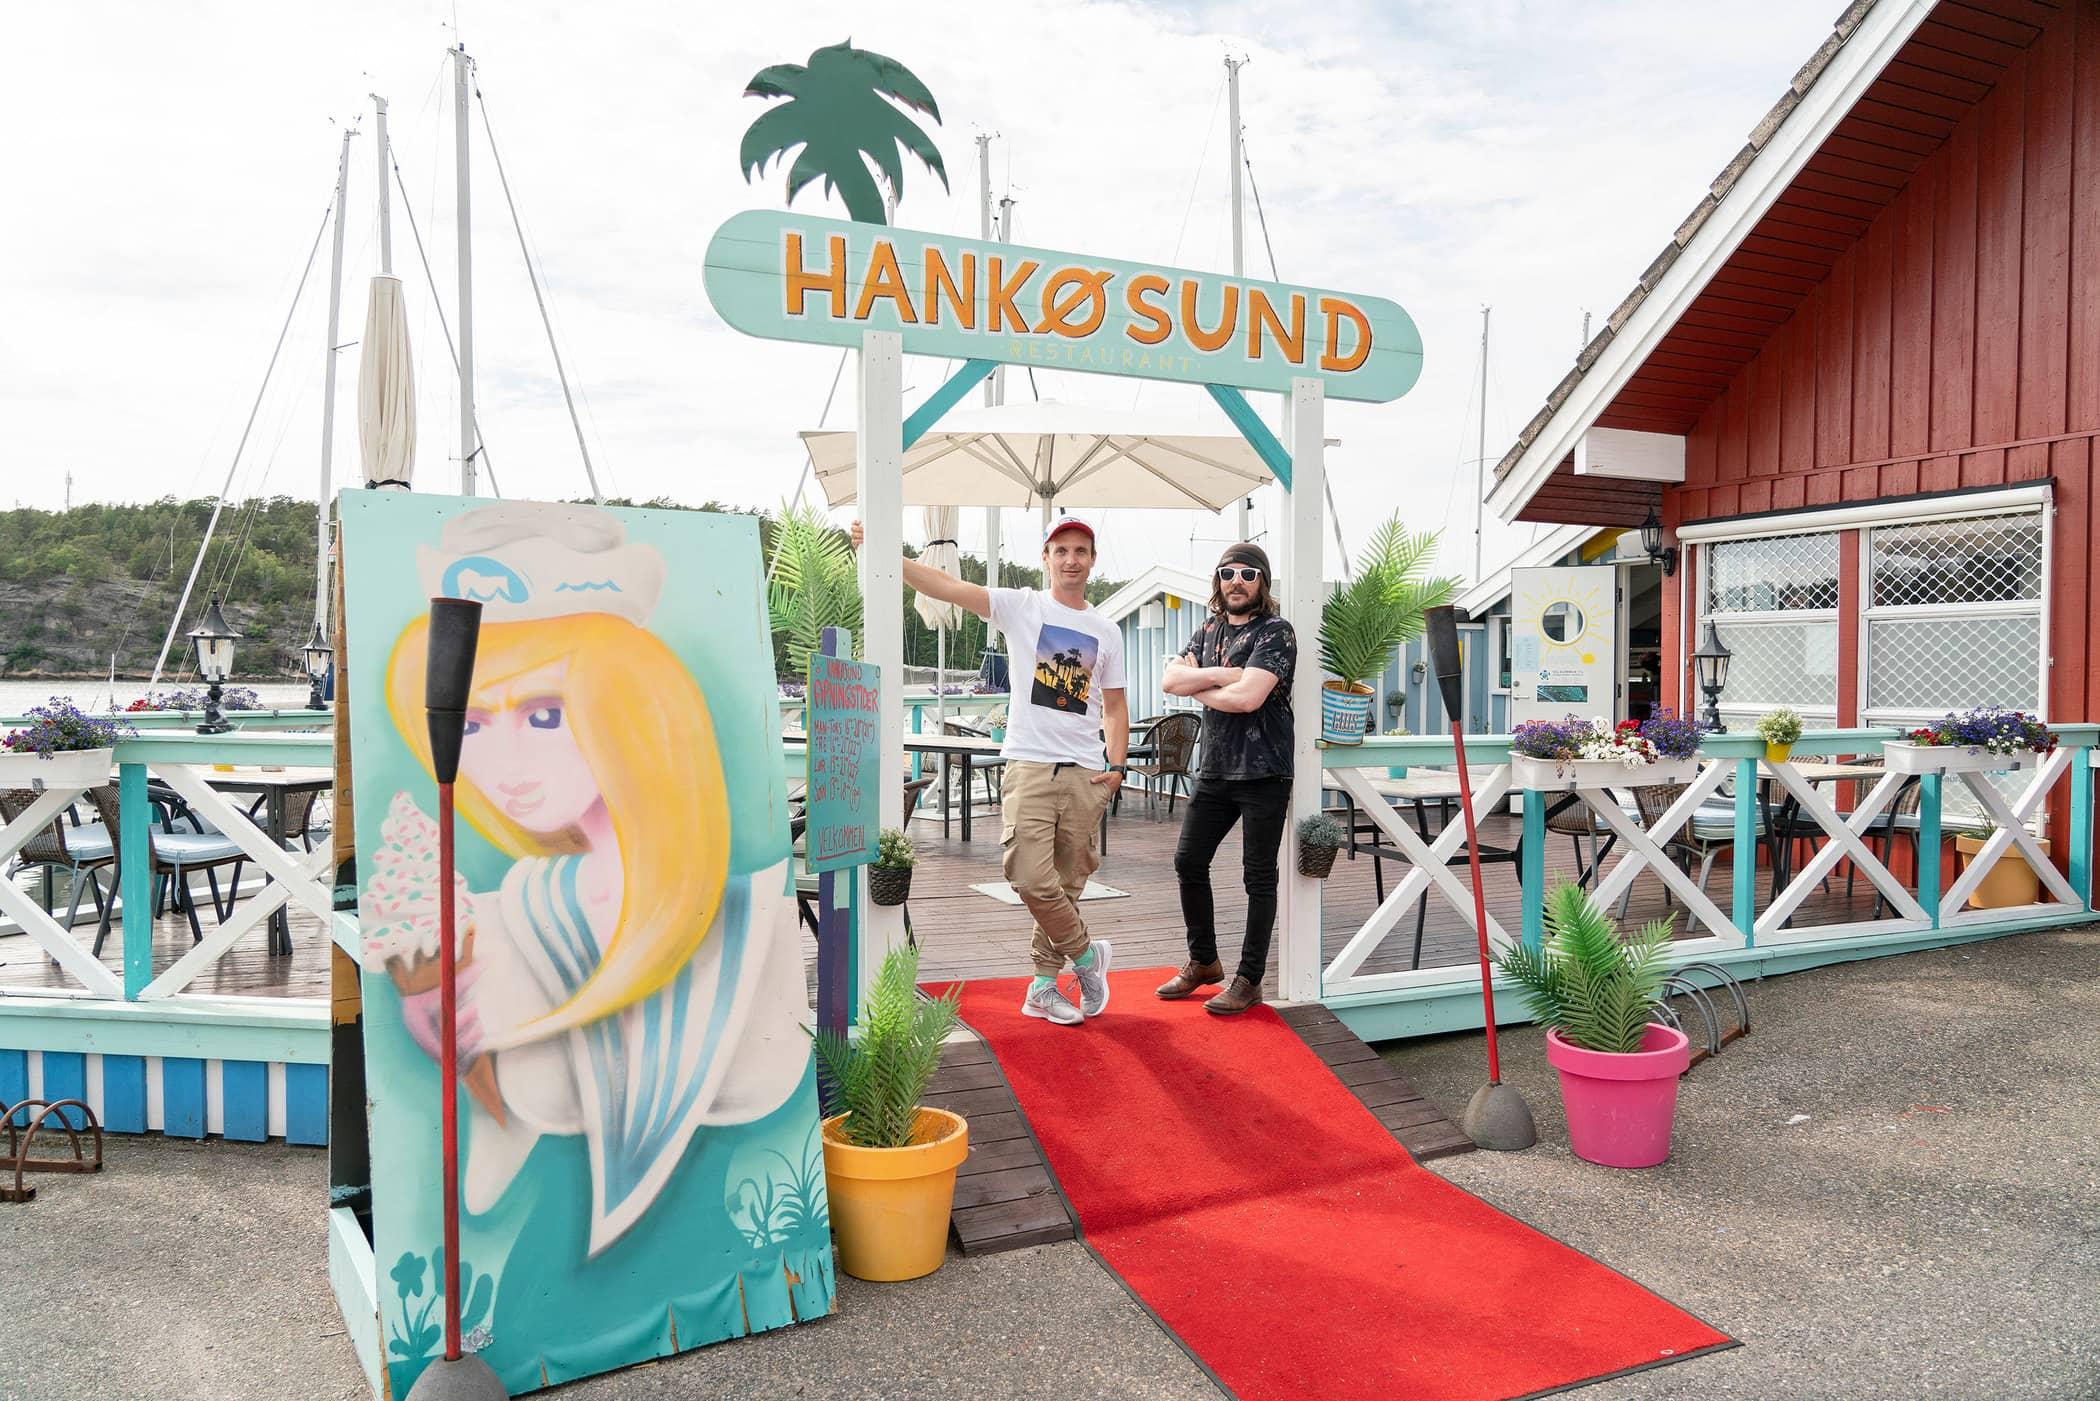 Hanksund_ekstra01.jpg